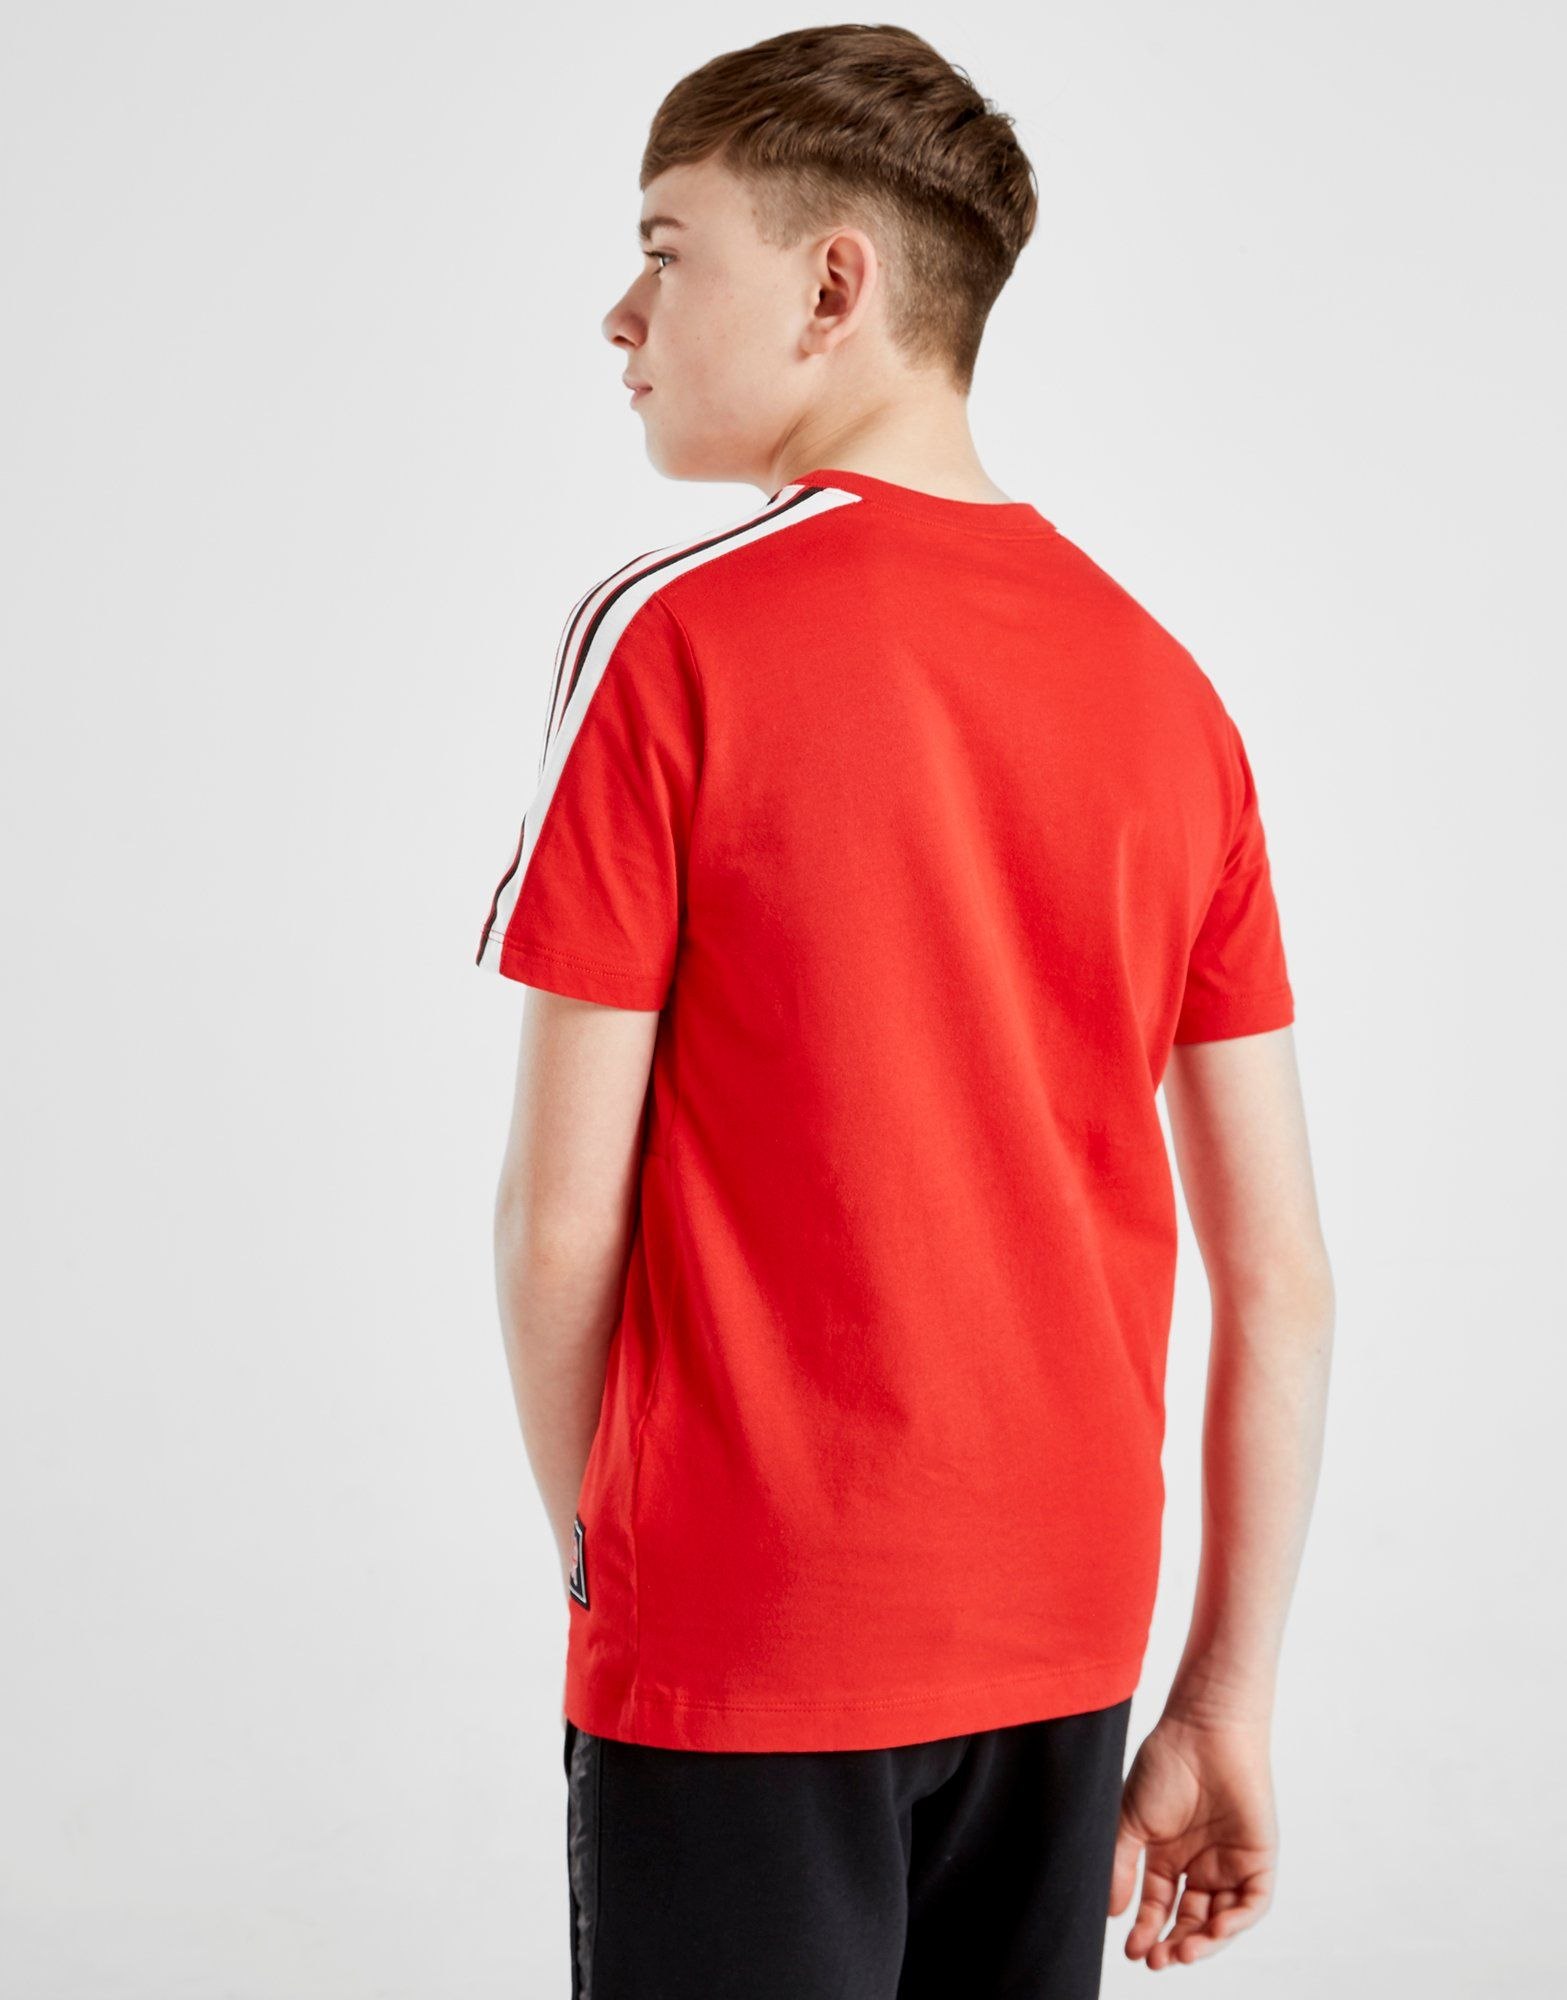 Nike Sportswear Air T-Shirt Kinder